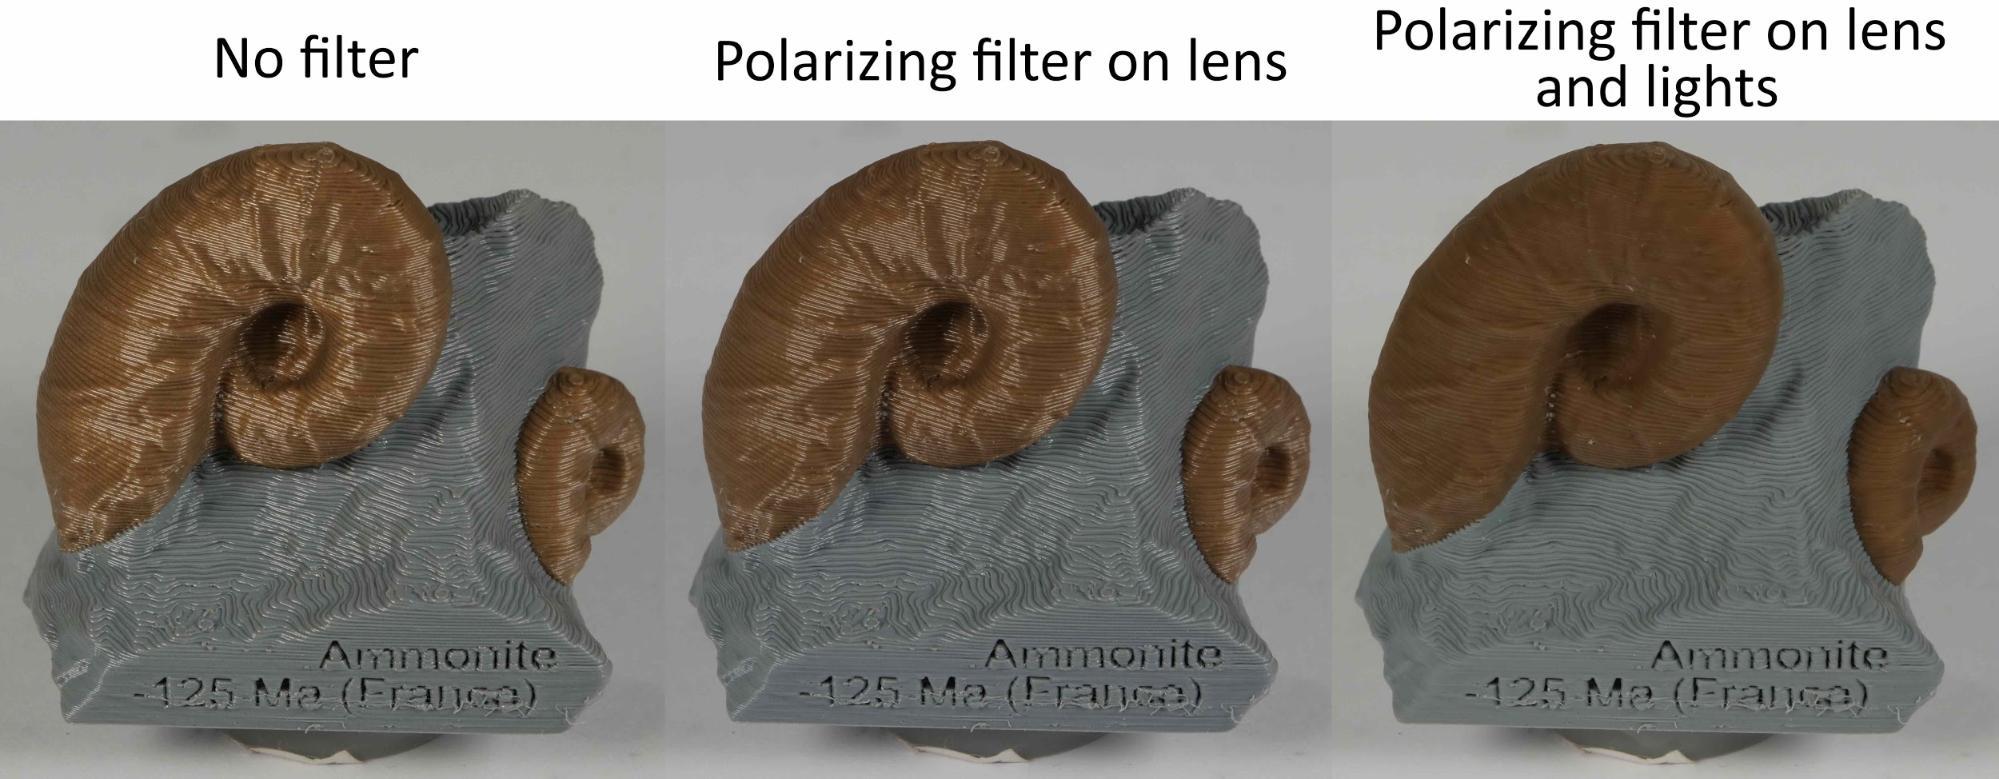 photogrammetry 3d scan cross polarization